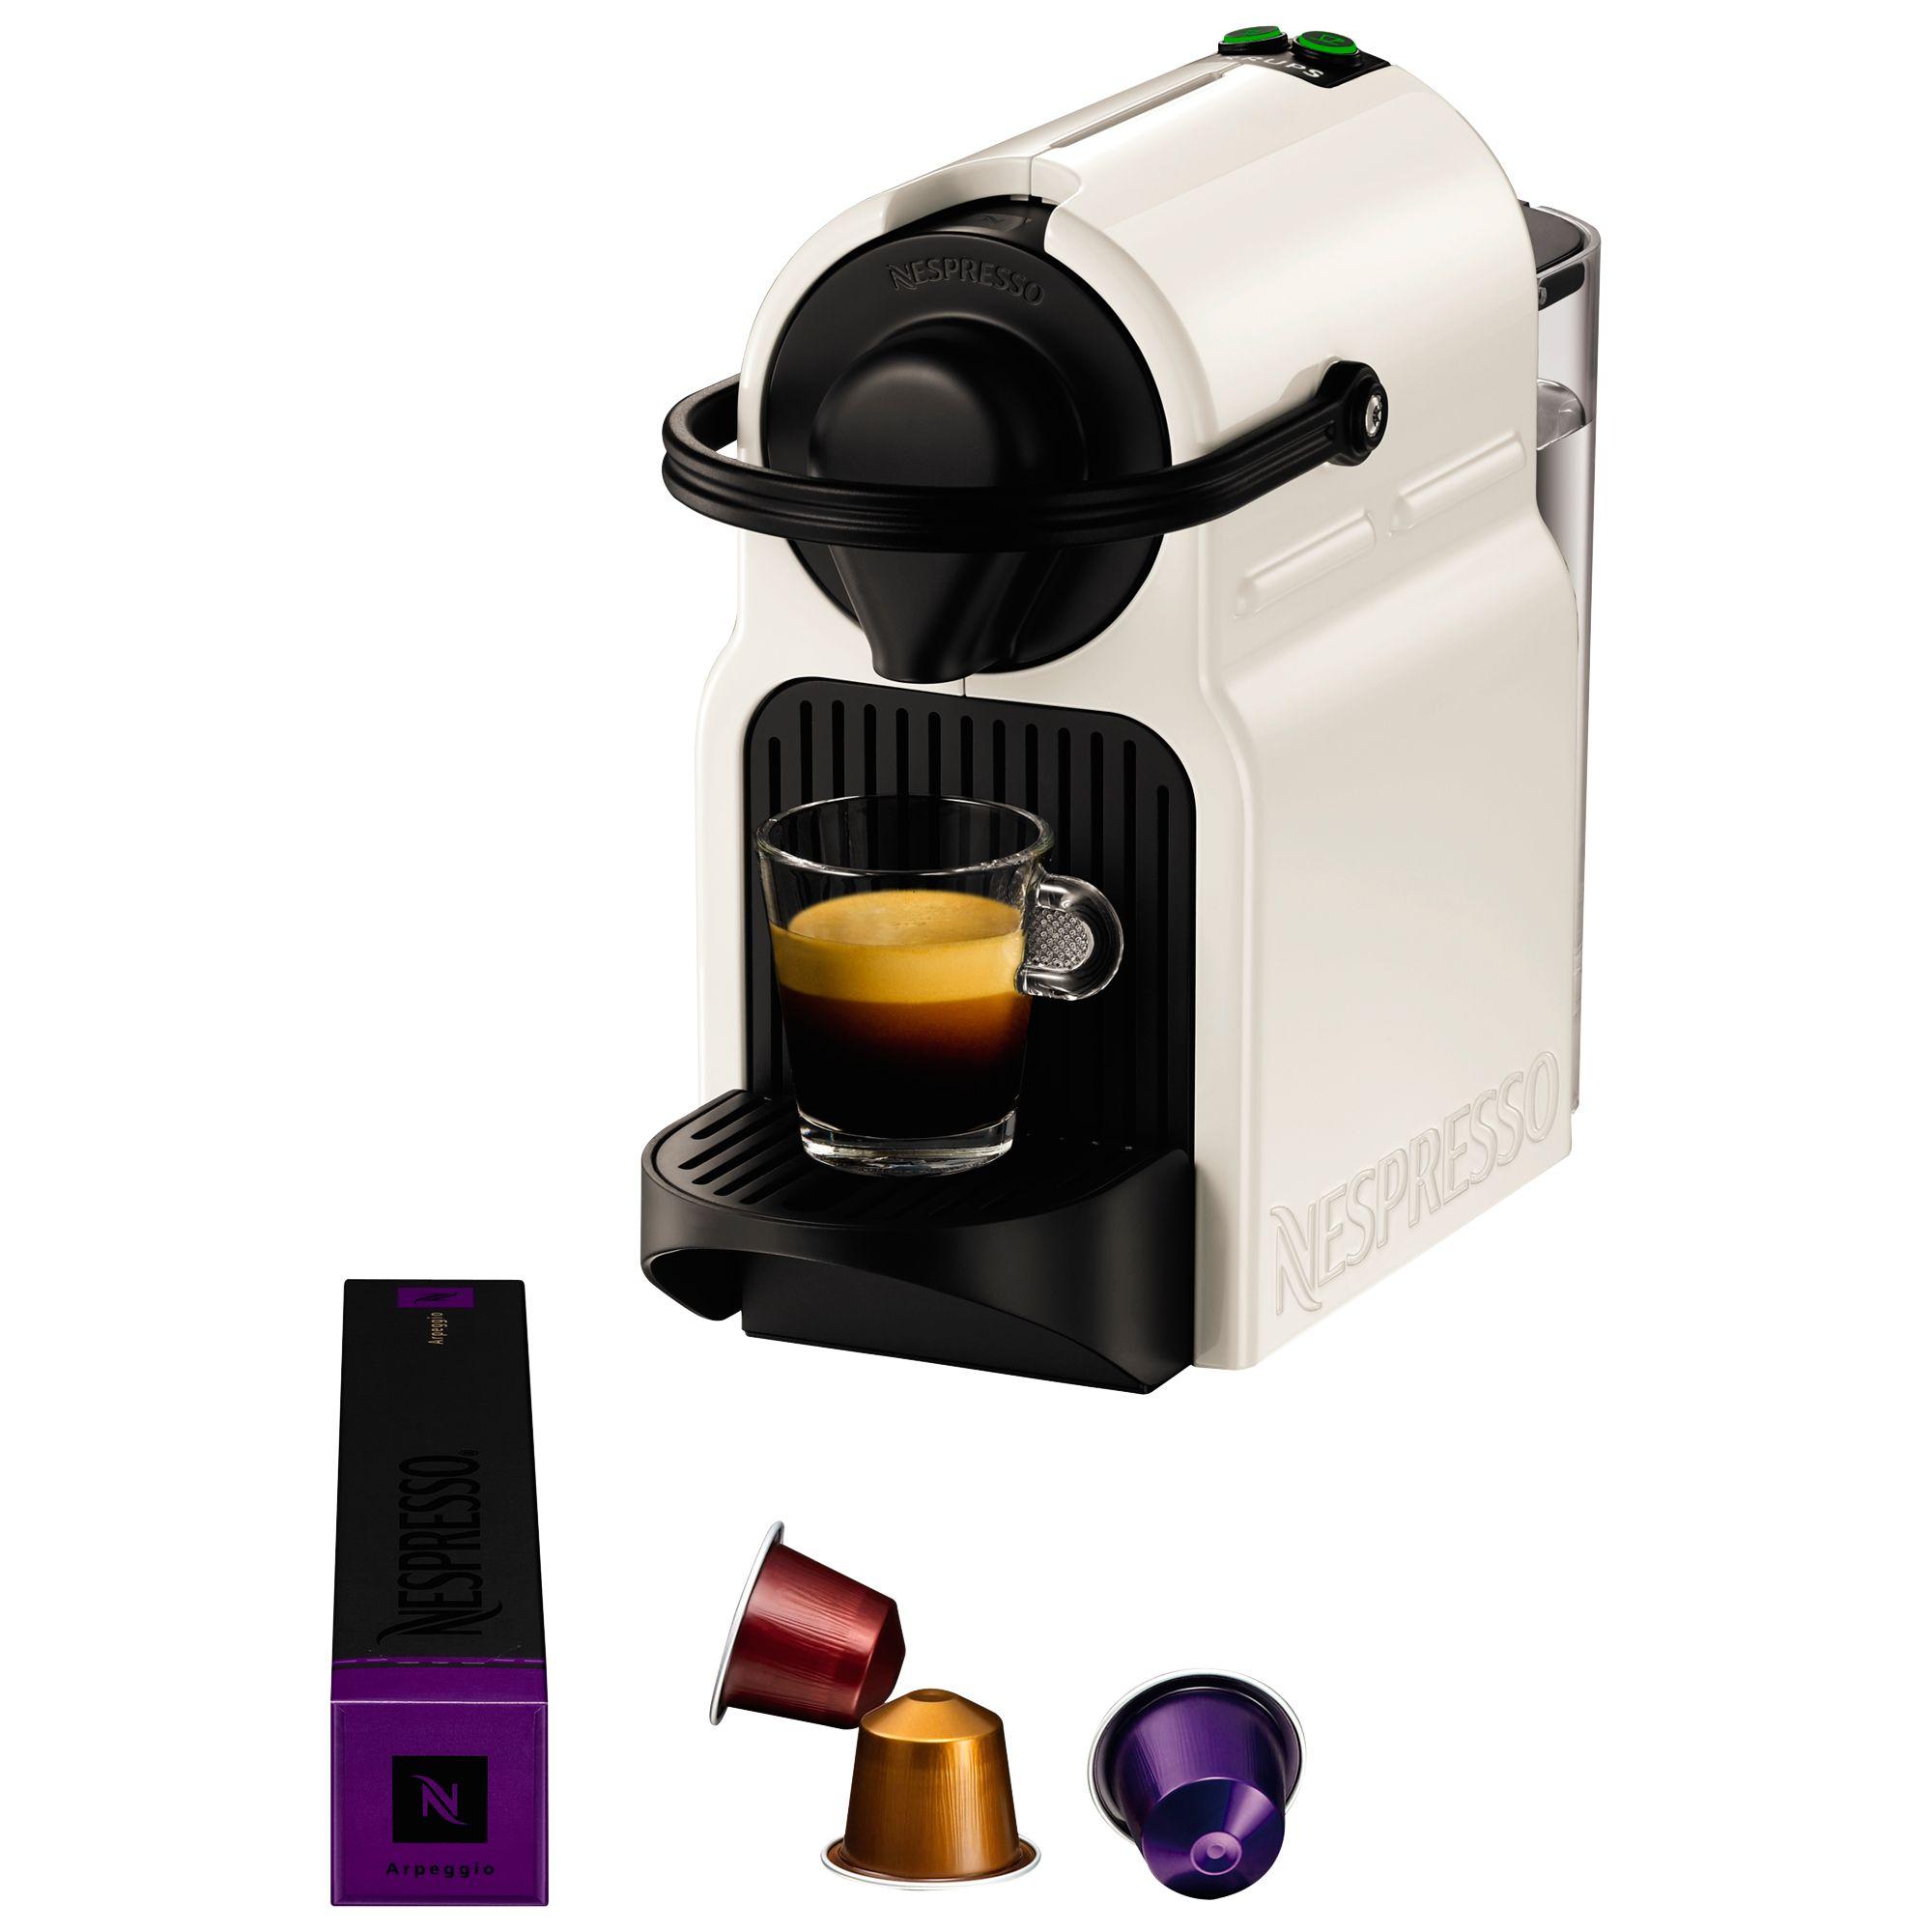 Krups Nespresso Inissia Coffee Machine with Aeroccino by KRUPS, White